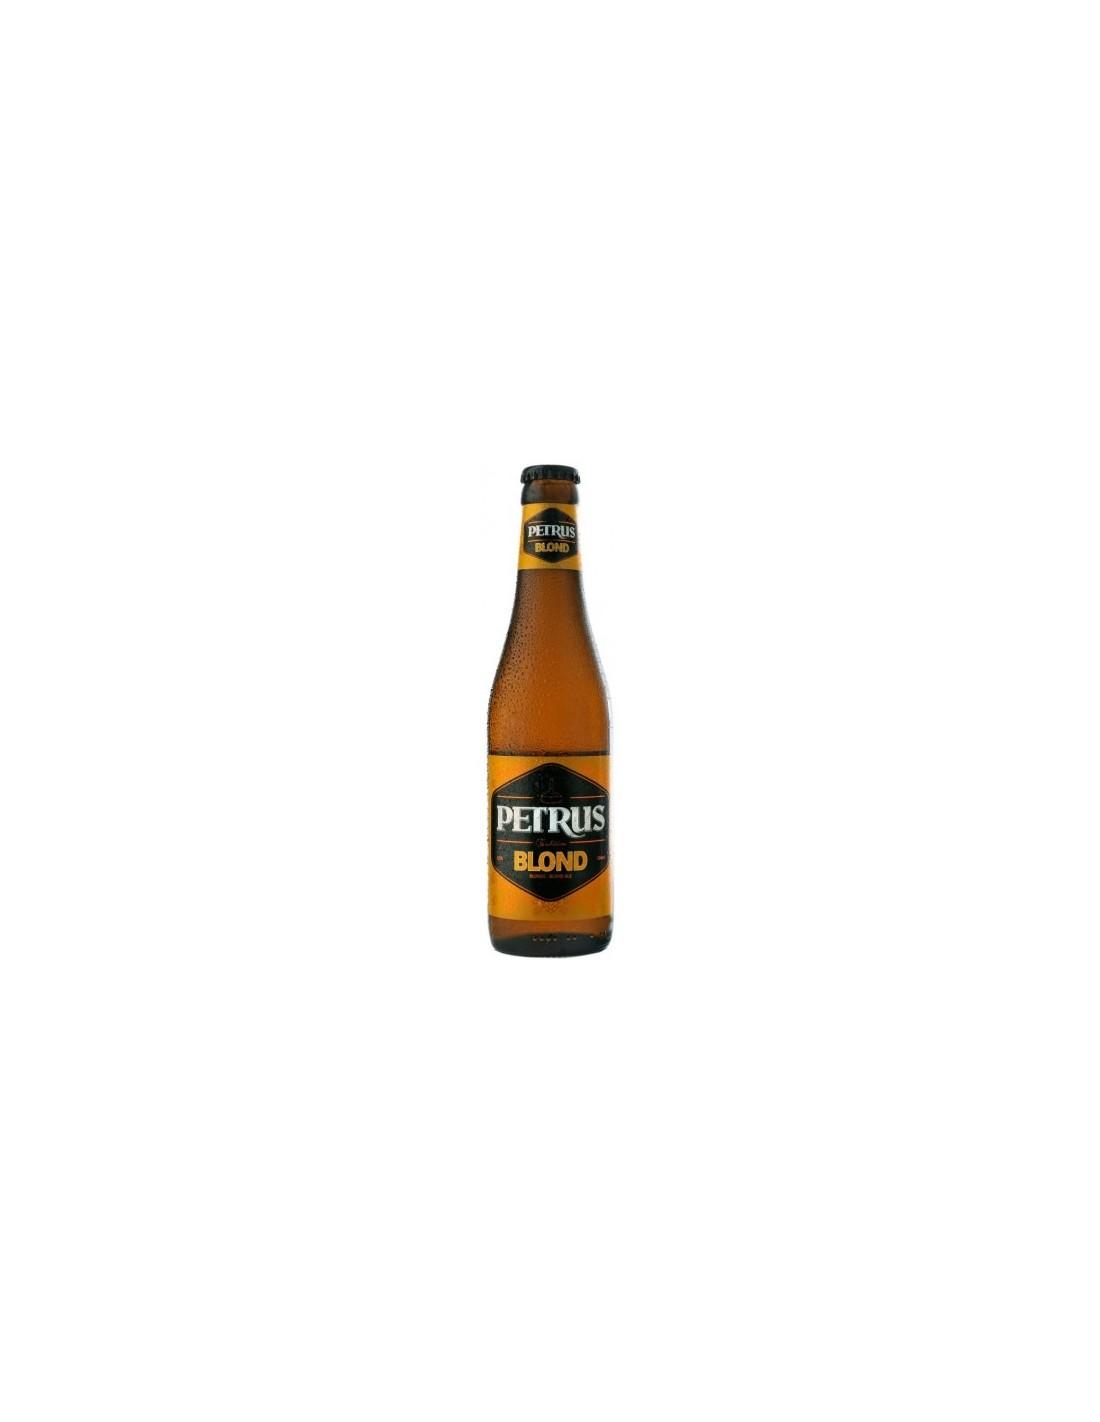 Bere blonda, filtrata Petrus, 6.6% alc., 0.33L, Belgia